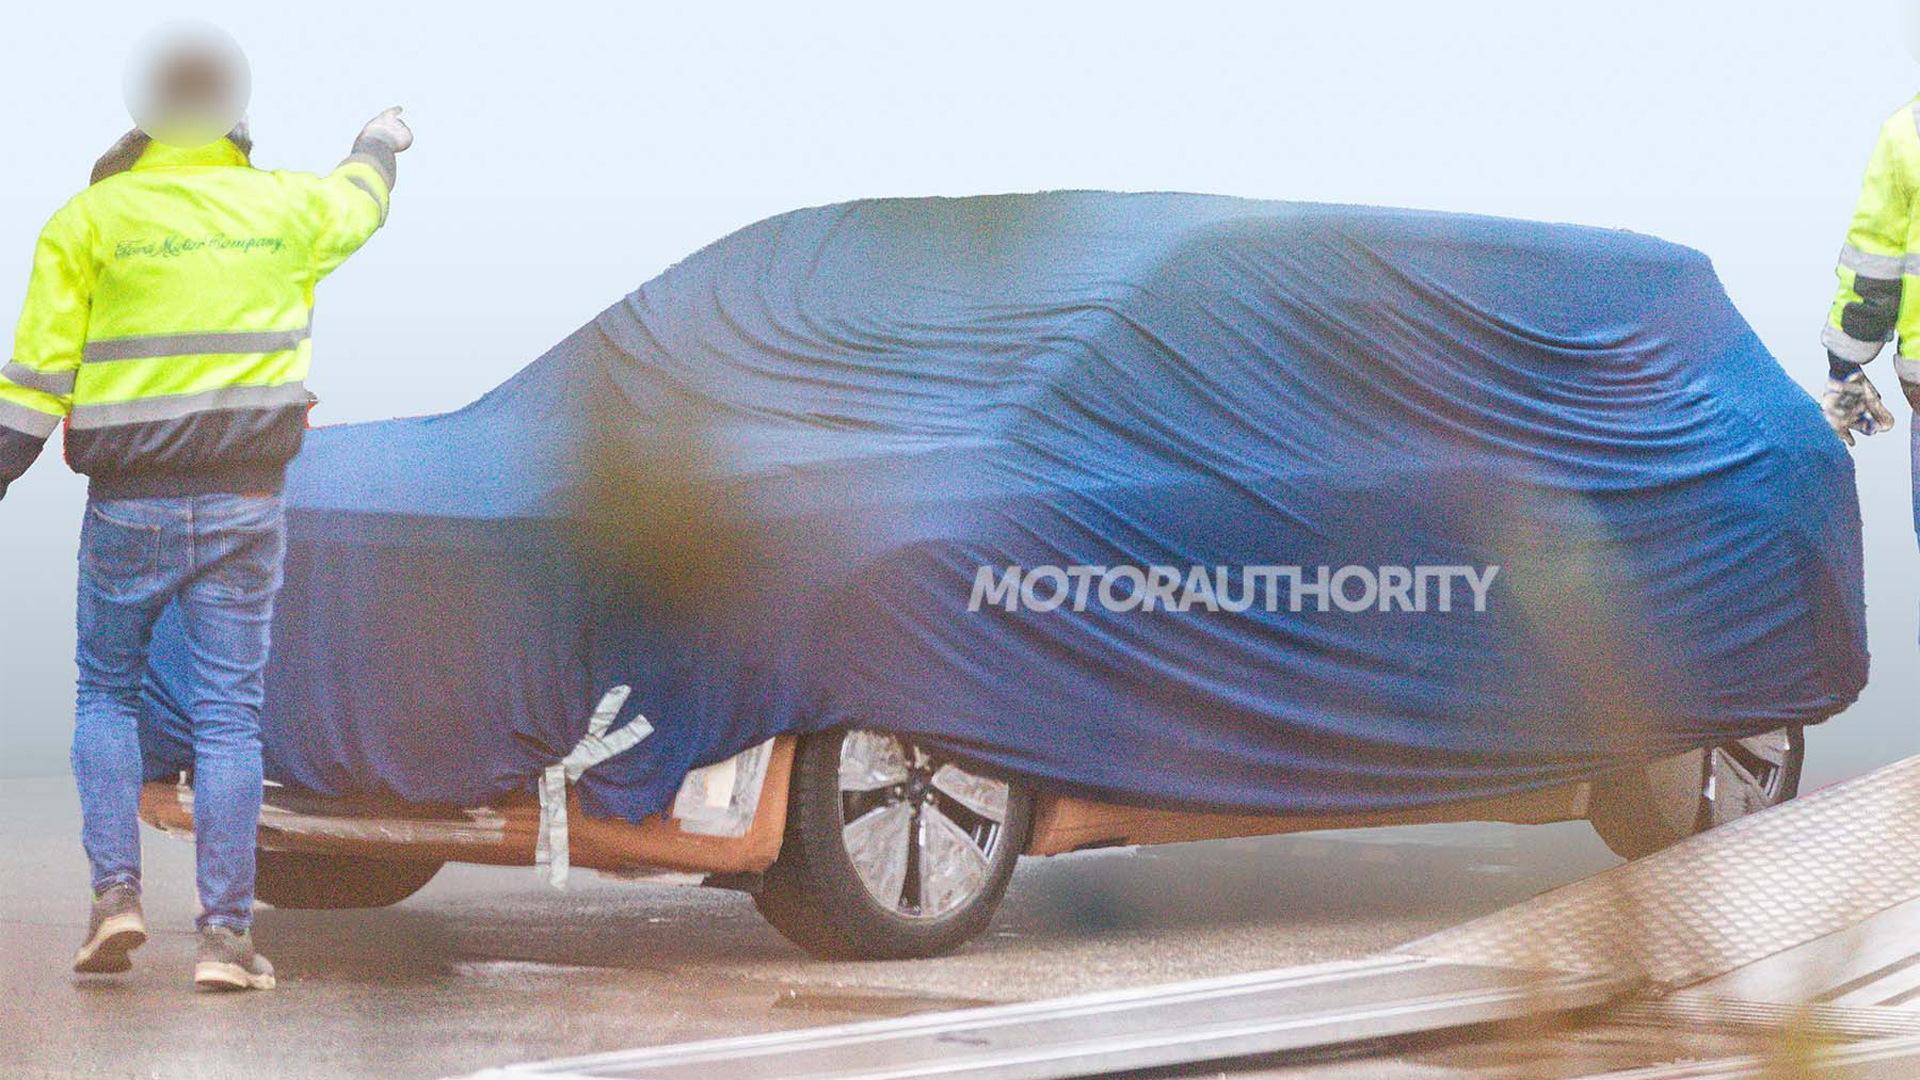 2023 Ford MEB-based electric crossover spy shots - Photo credit:S. Baldauf/SB-Medien